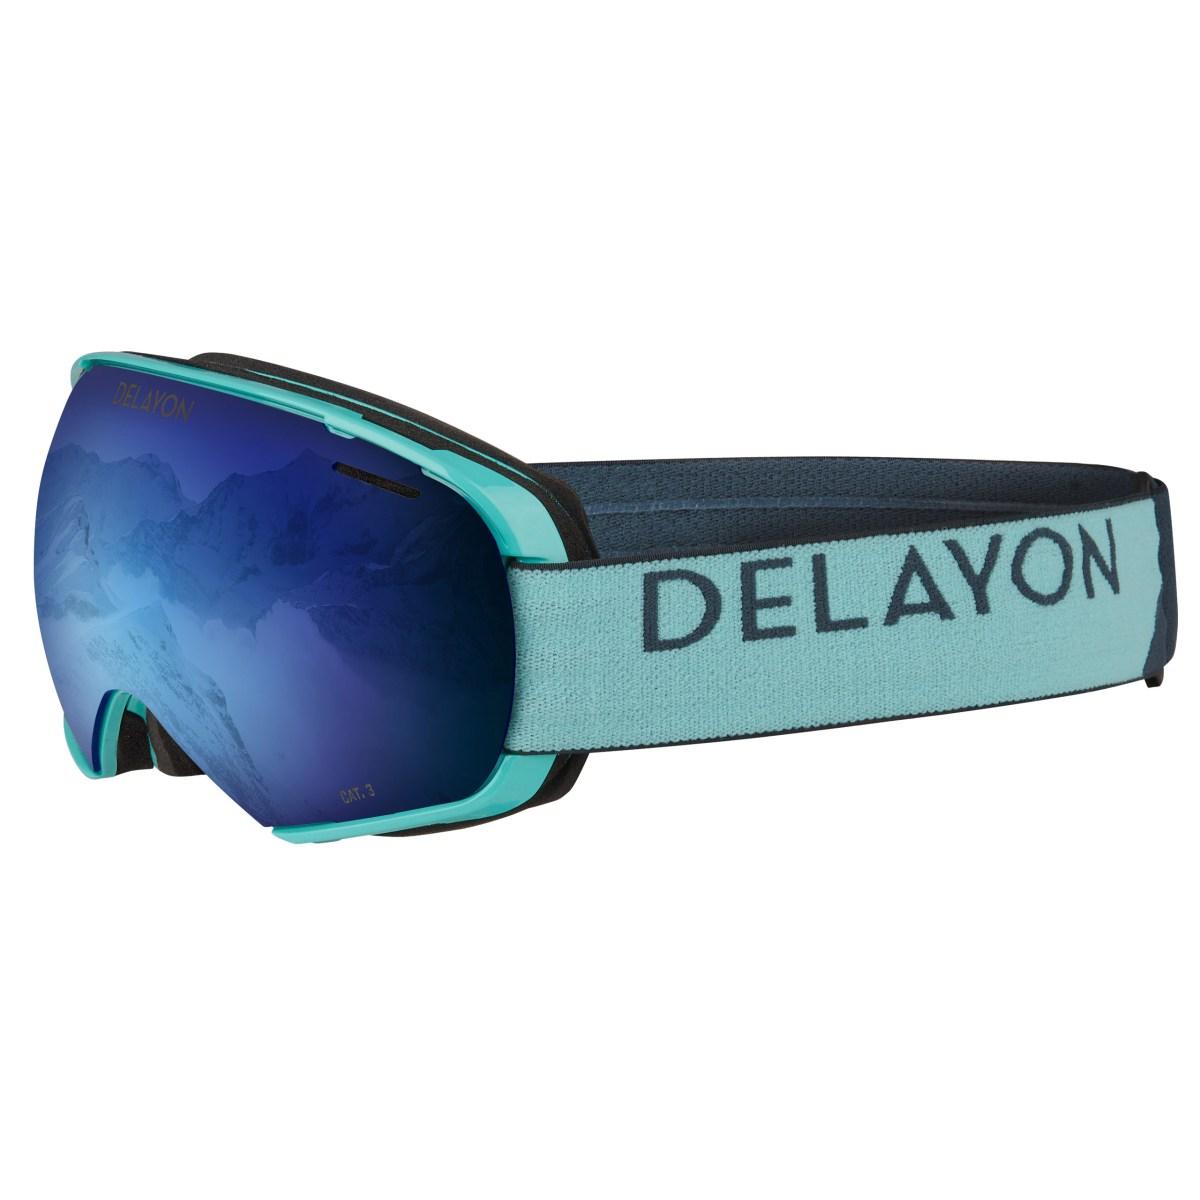 DELAYON Eyewear Puzzle Goggle Turquise Space Blue